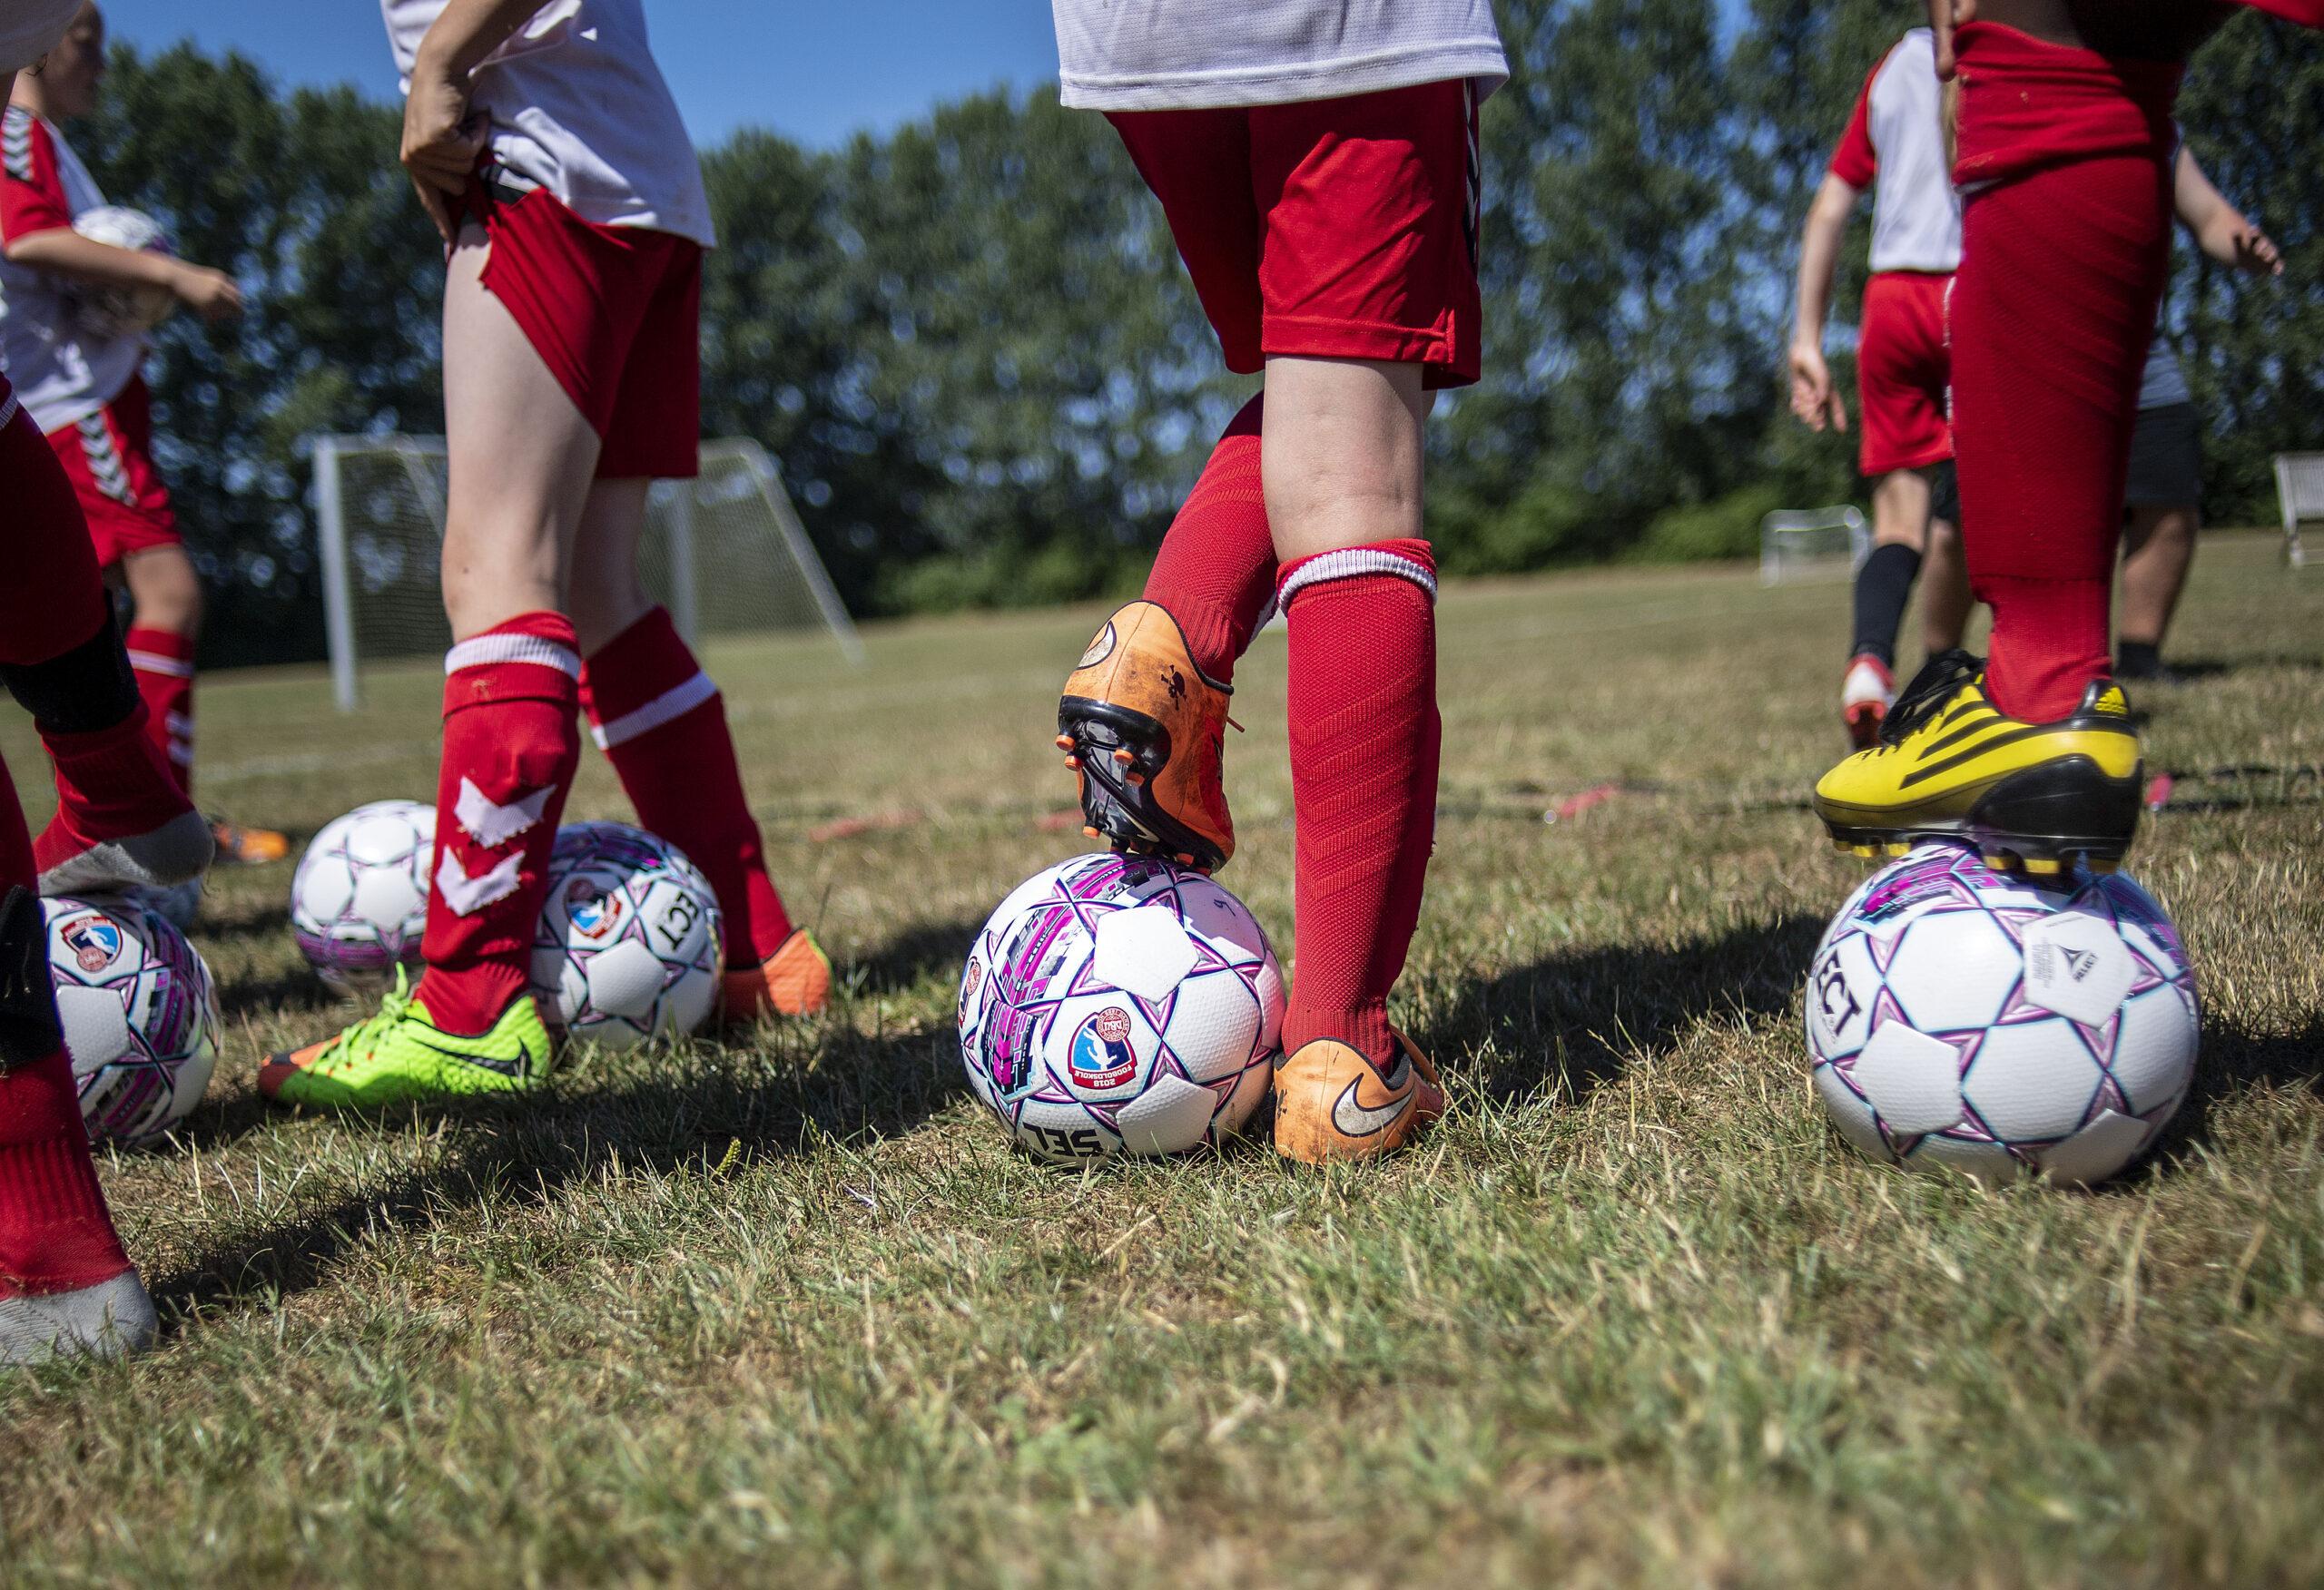 [DK=20180712: DBU Fodboldskole i Vejby Tisvilde IF] [UK=20180712: DBU Grassroots in Vejby Tisvilde IF]